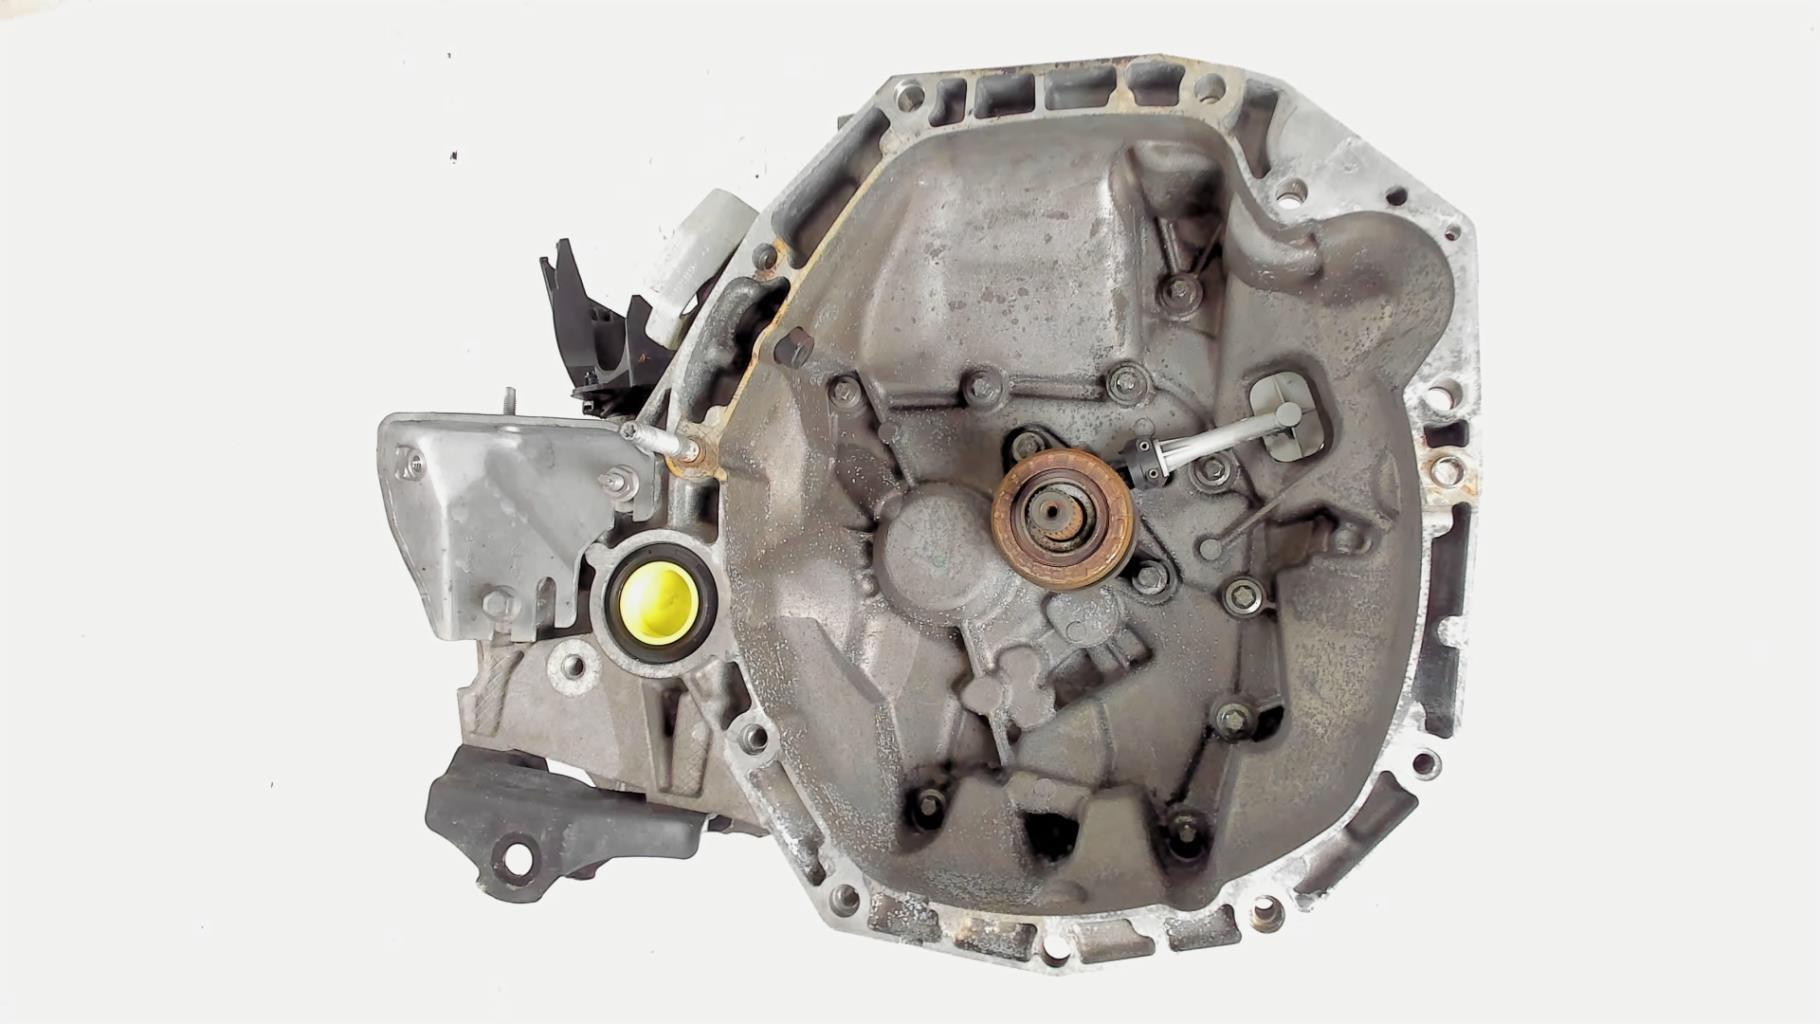 Image Boite de vitesses - RENAULT CLIO 4